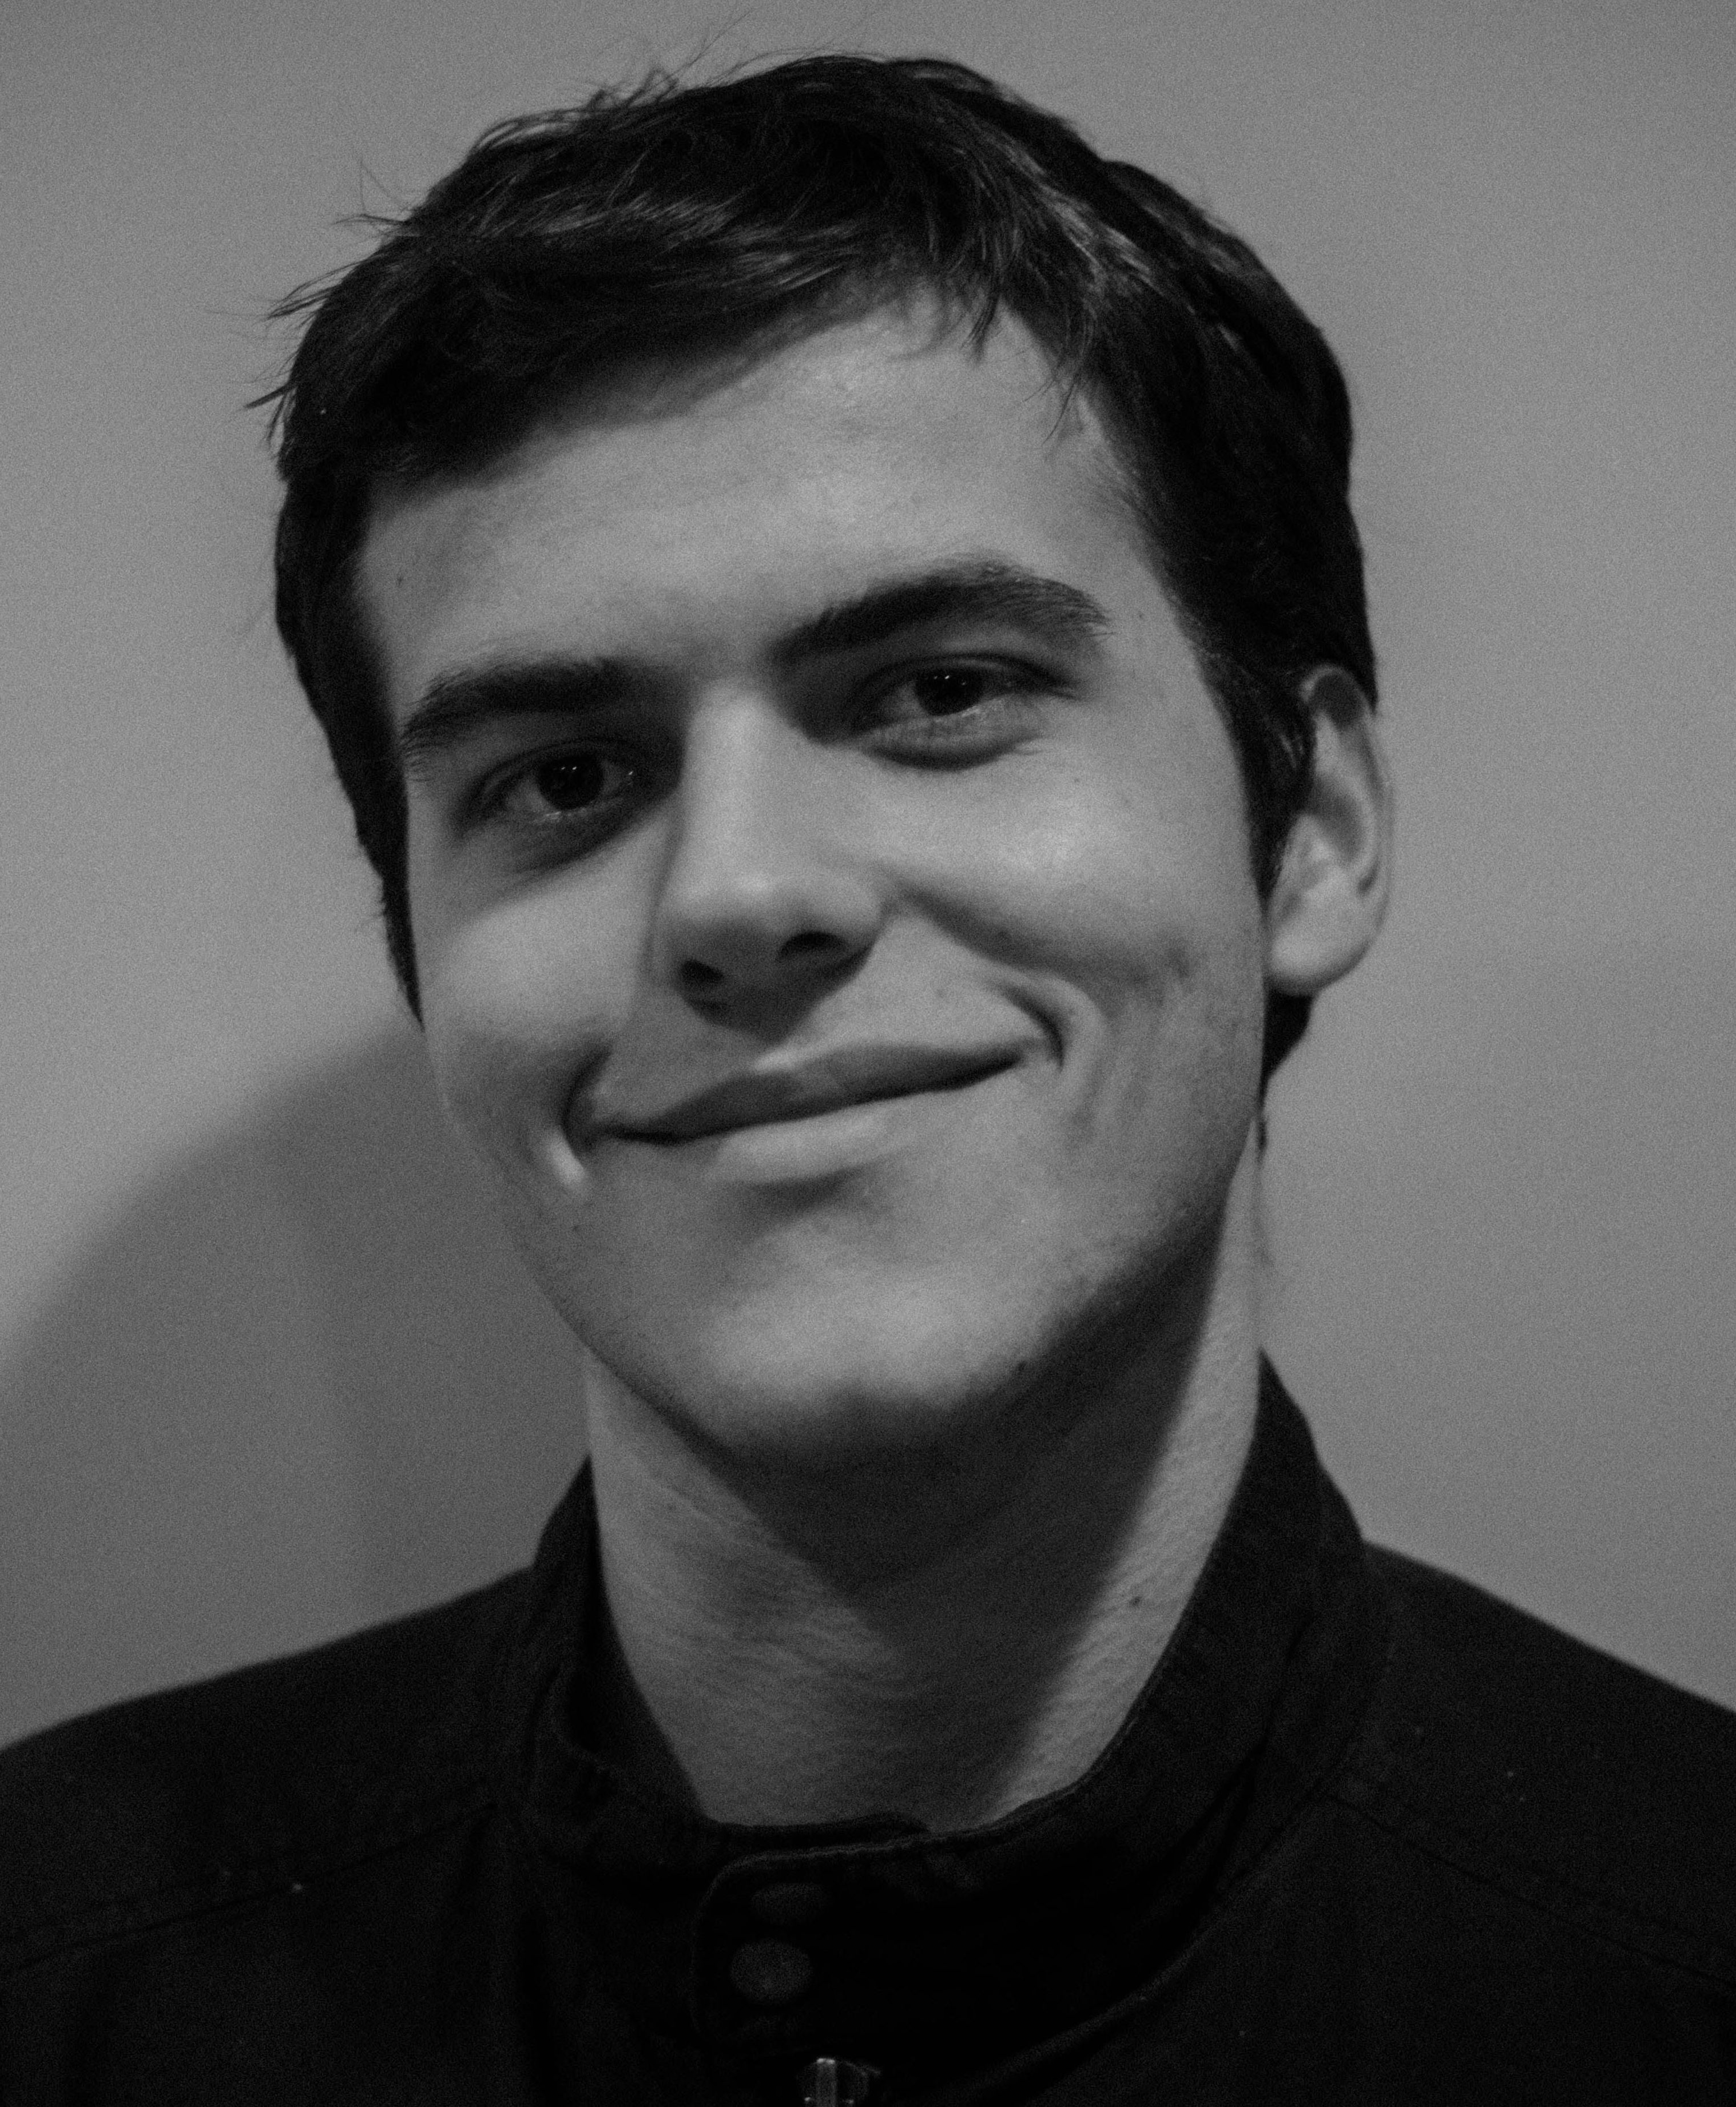 Daniel Yadin